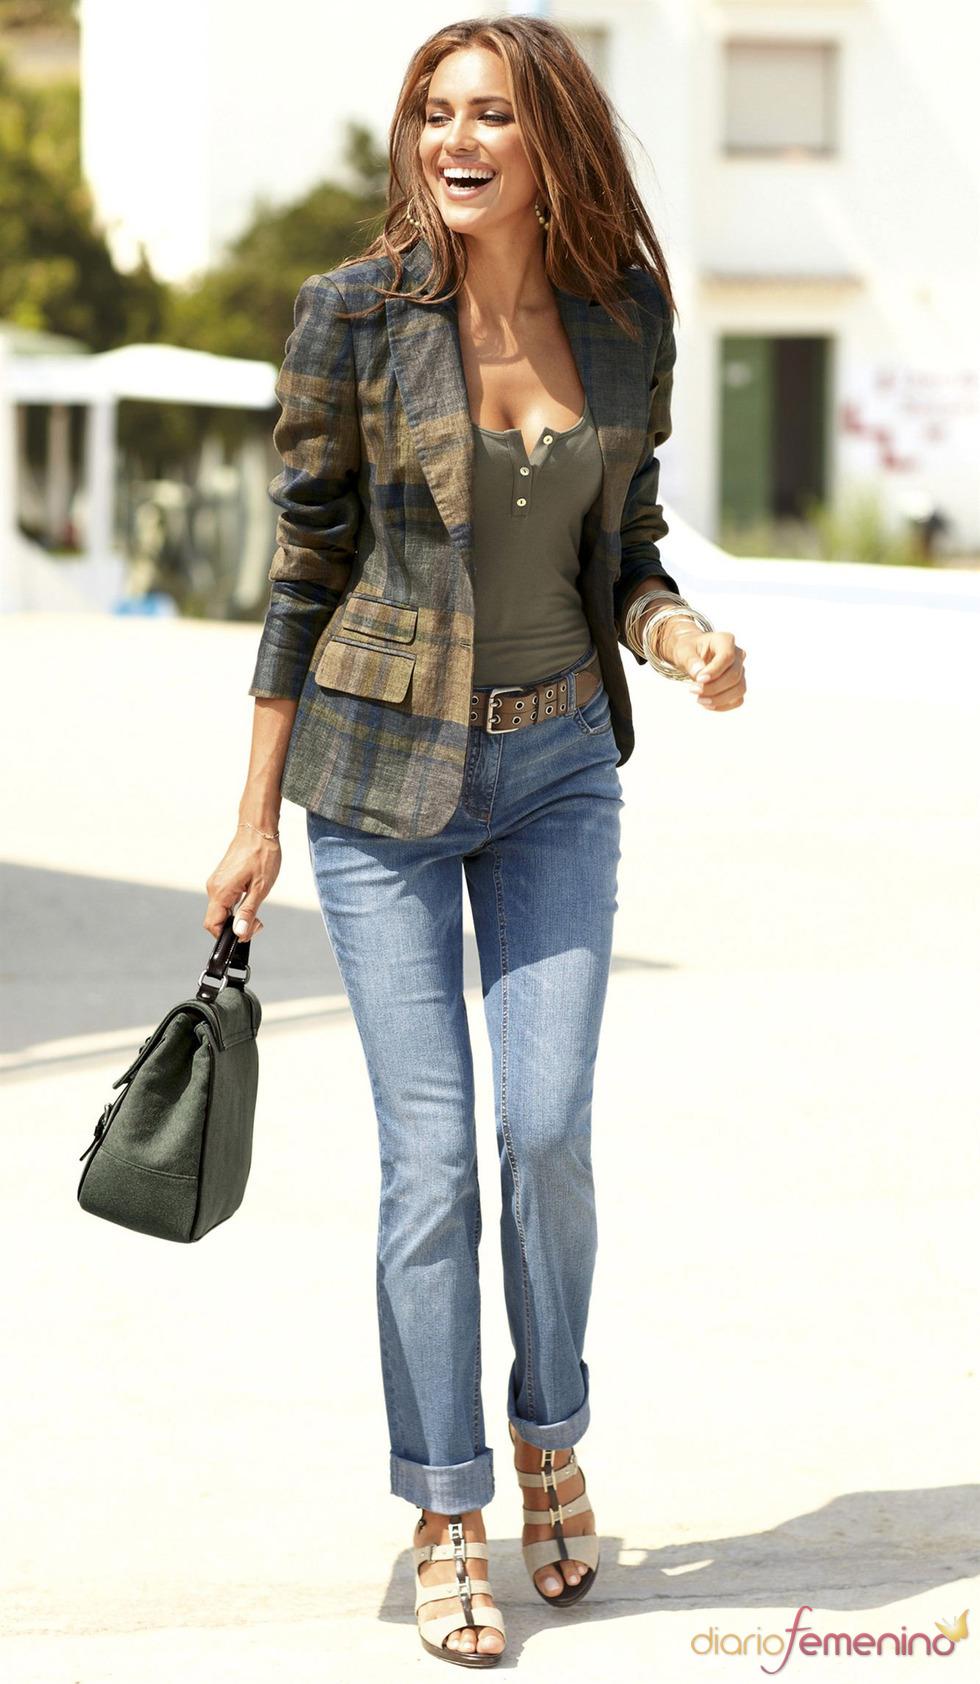 Irina Shayk vestido con ropa informal de la primavera 2011